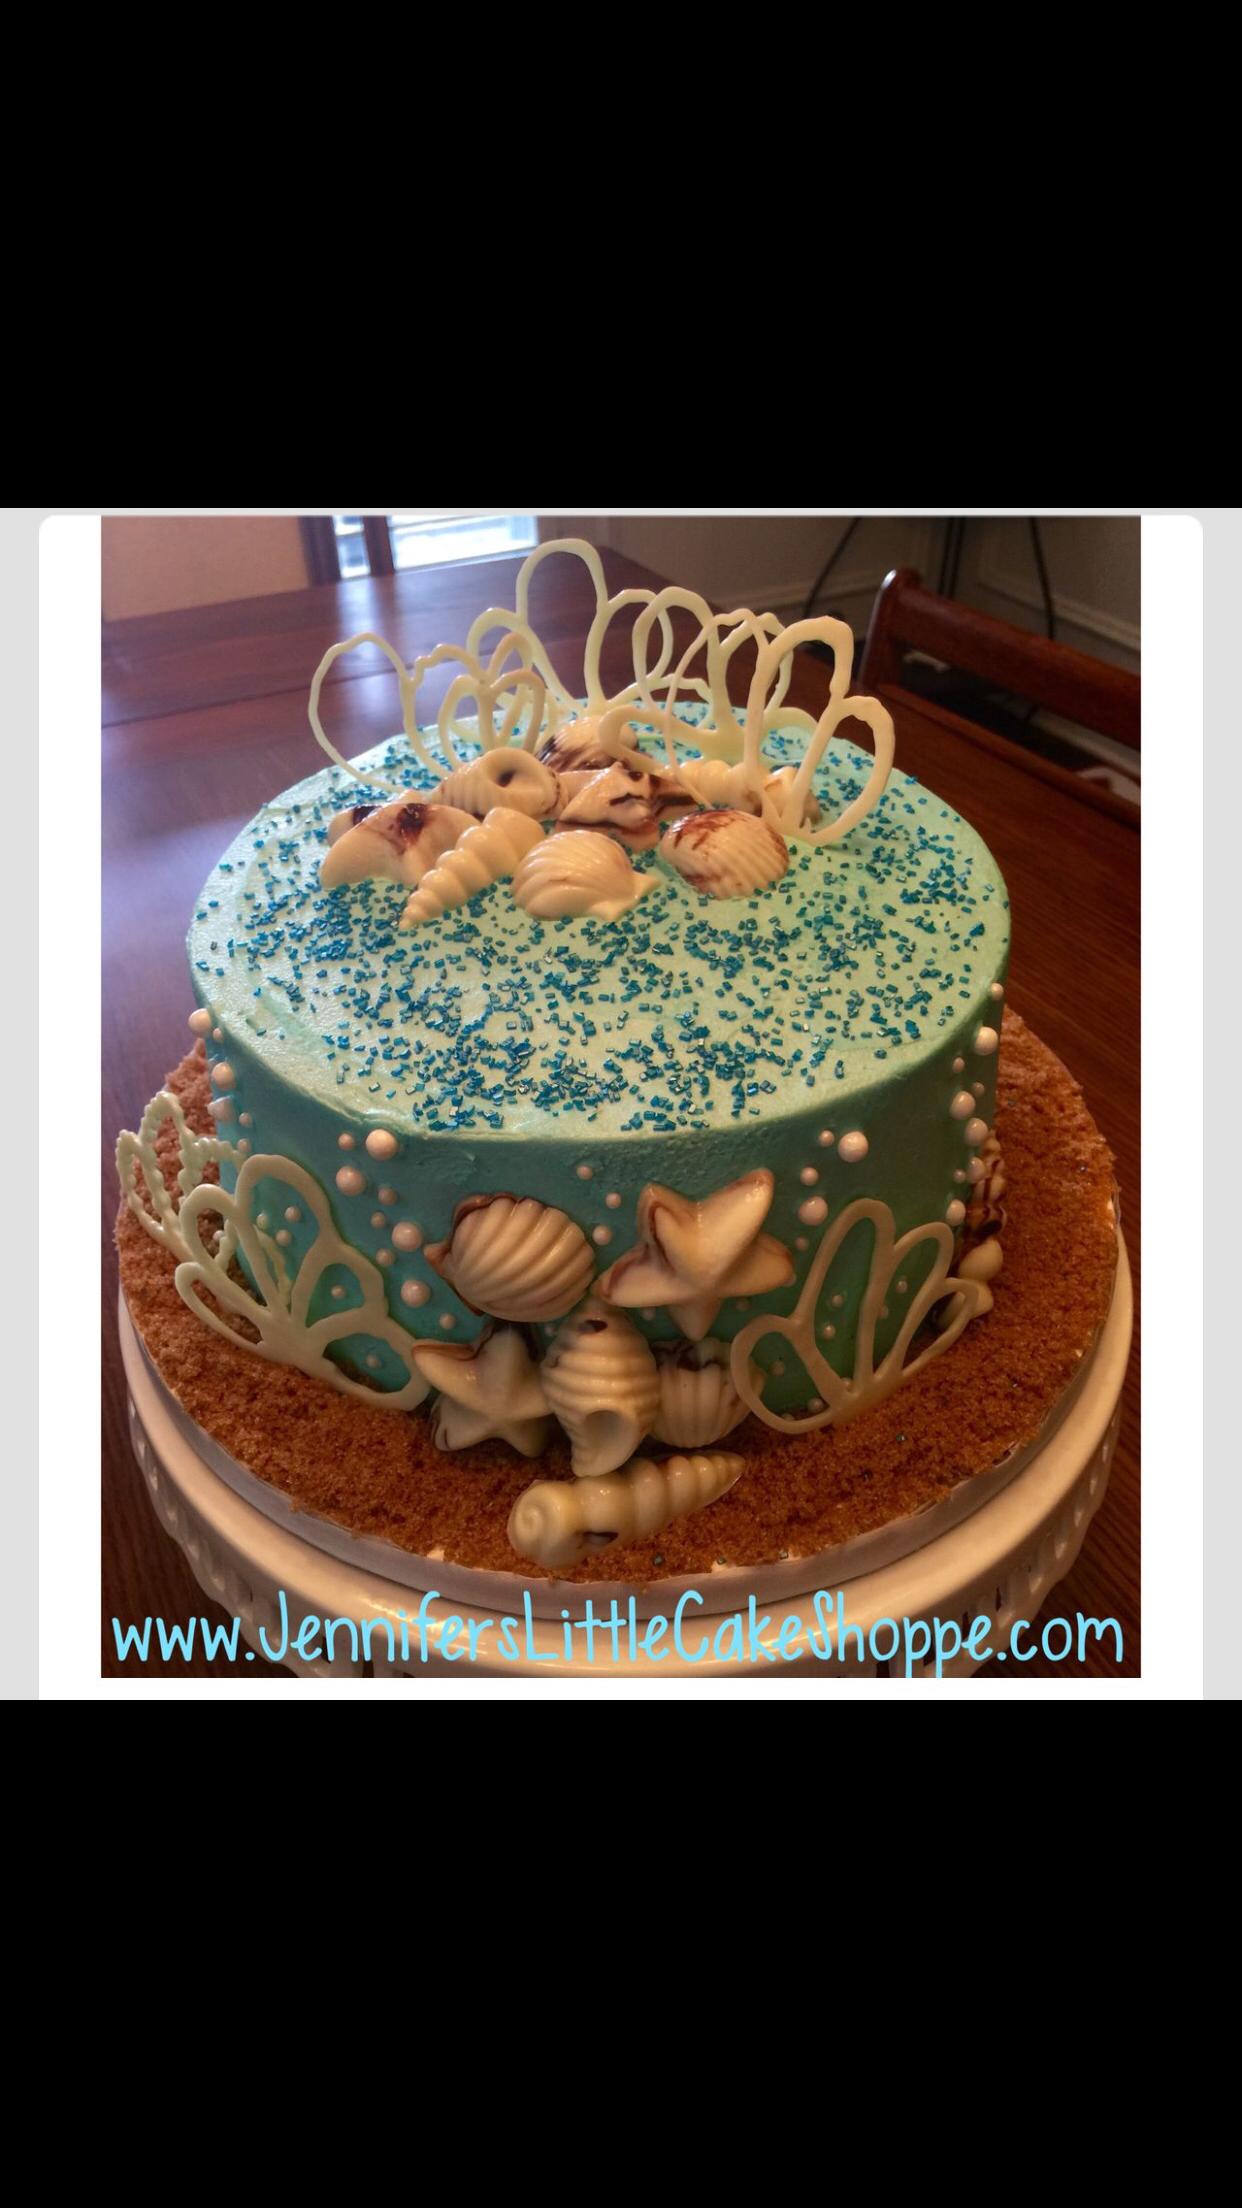 Seashell Birthday Cake With Chocolate Seashells From Jennifers